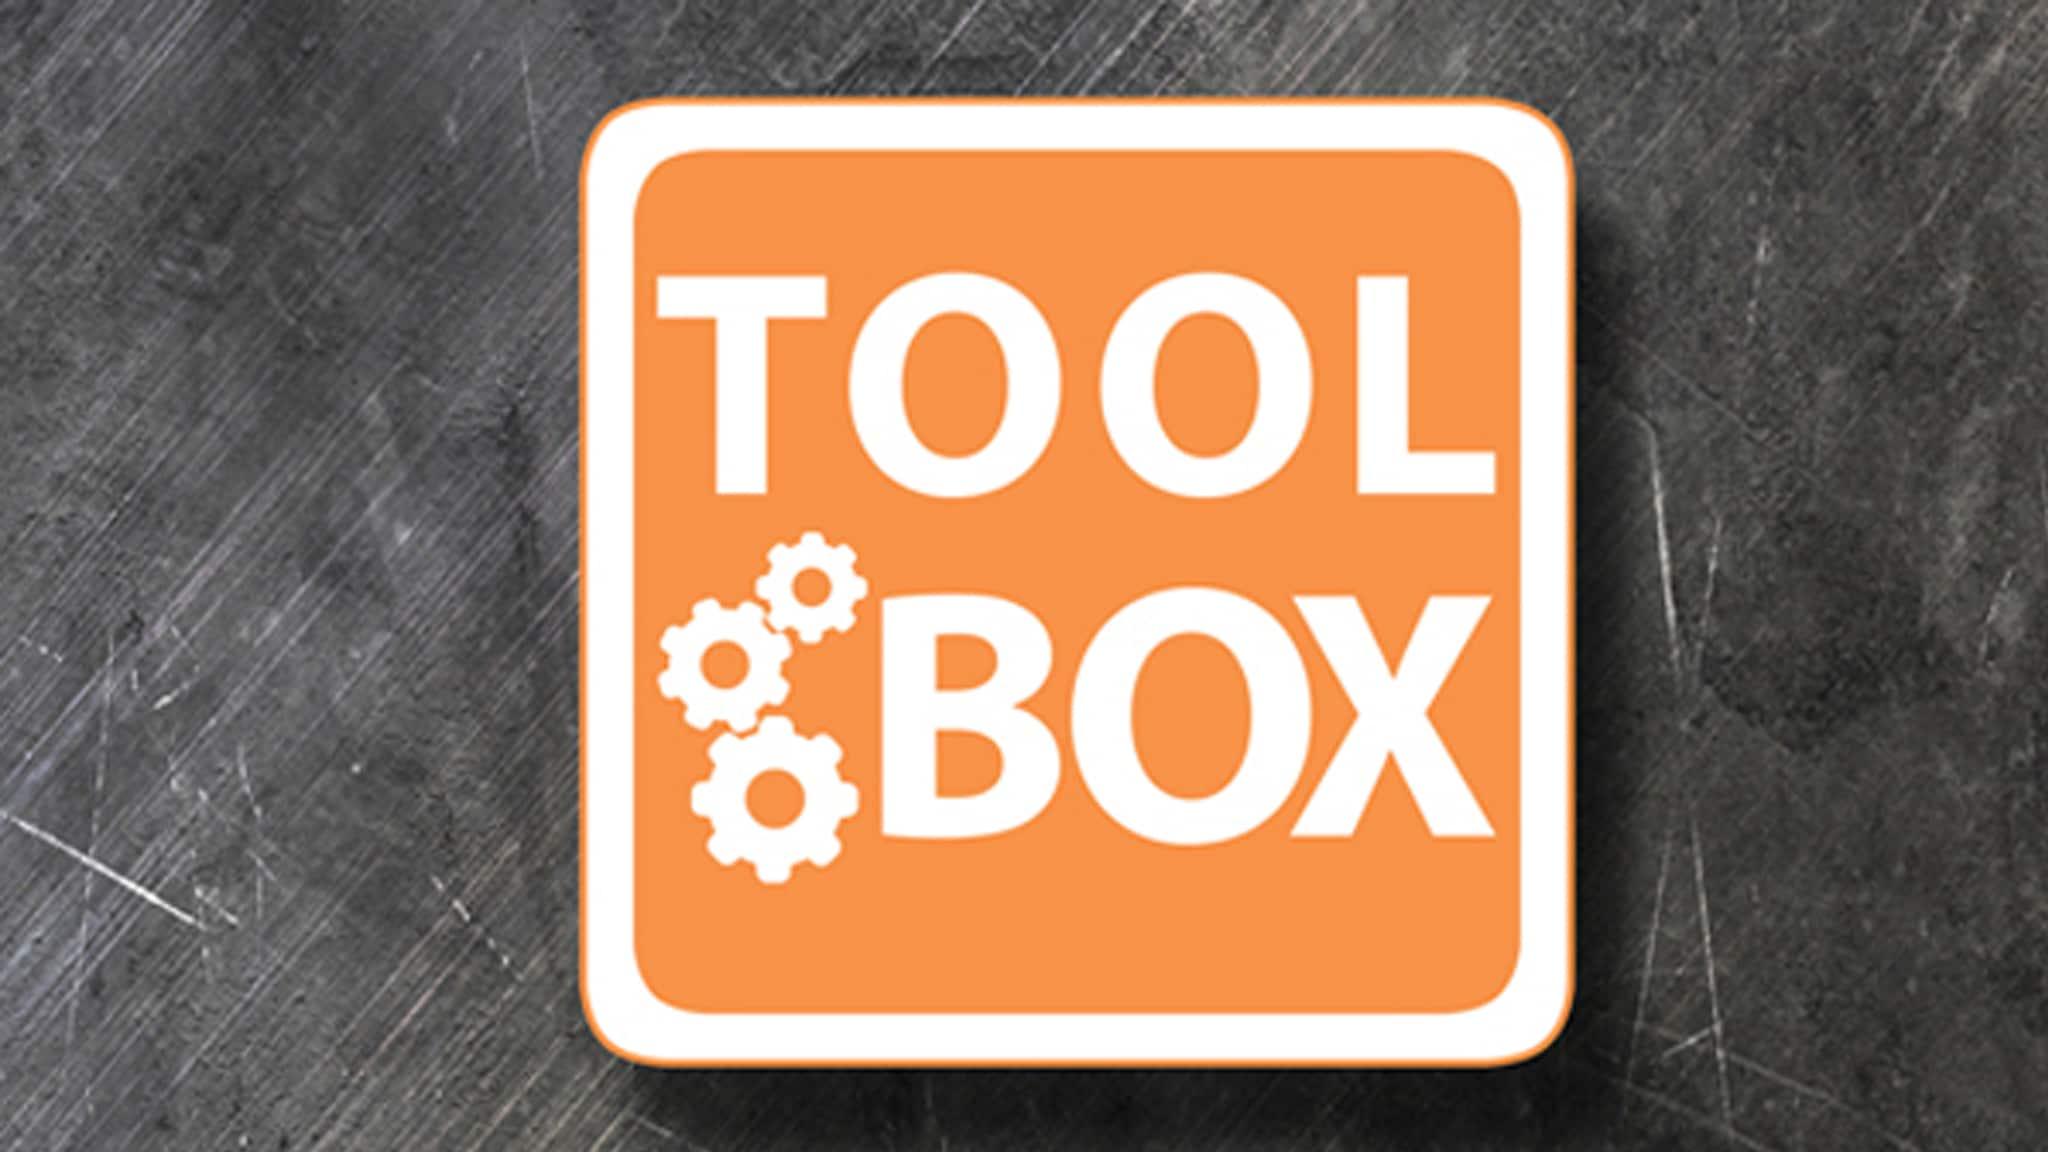 Rai Scuola Toolbox II Parametri e variabili insegnanti Replica